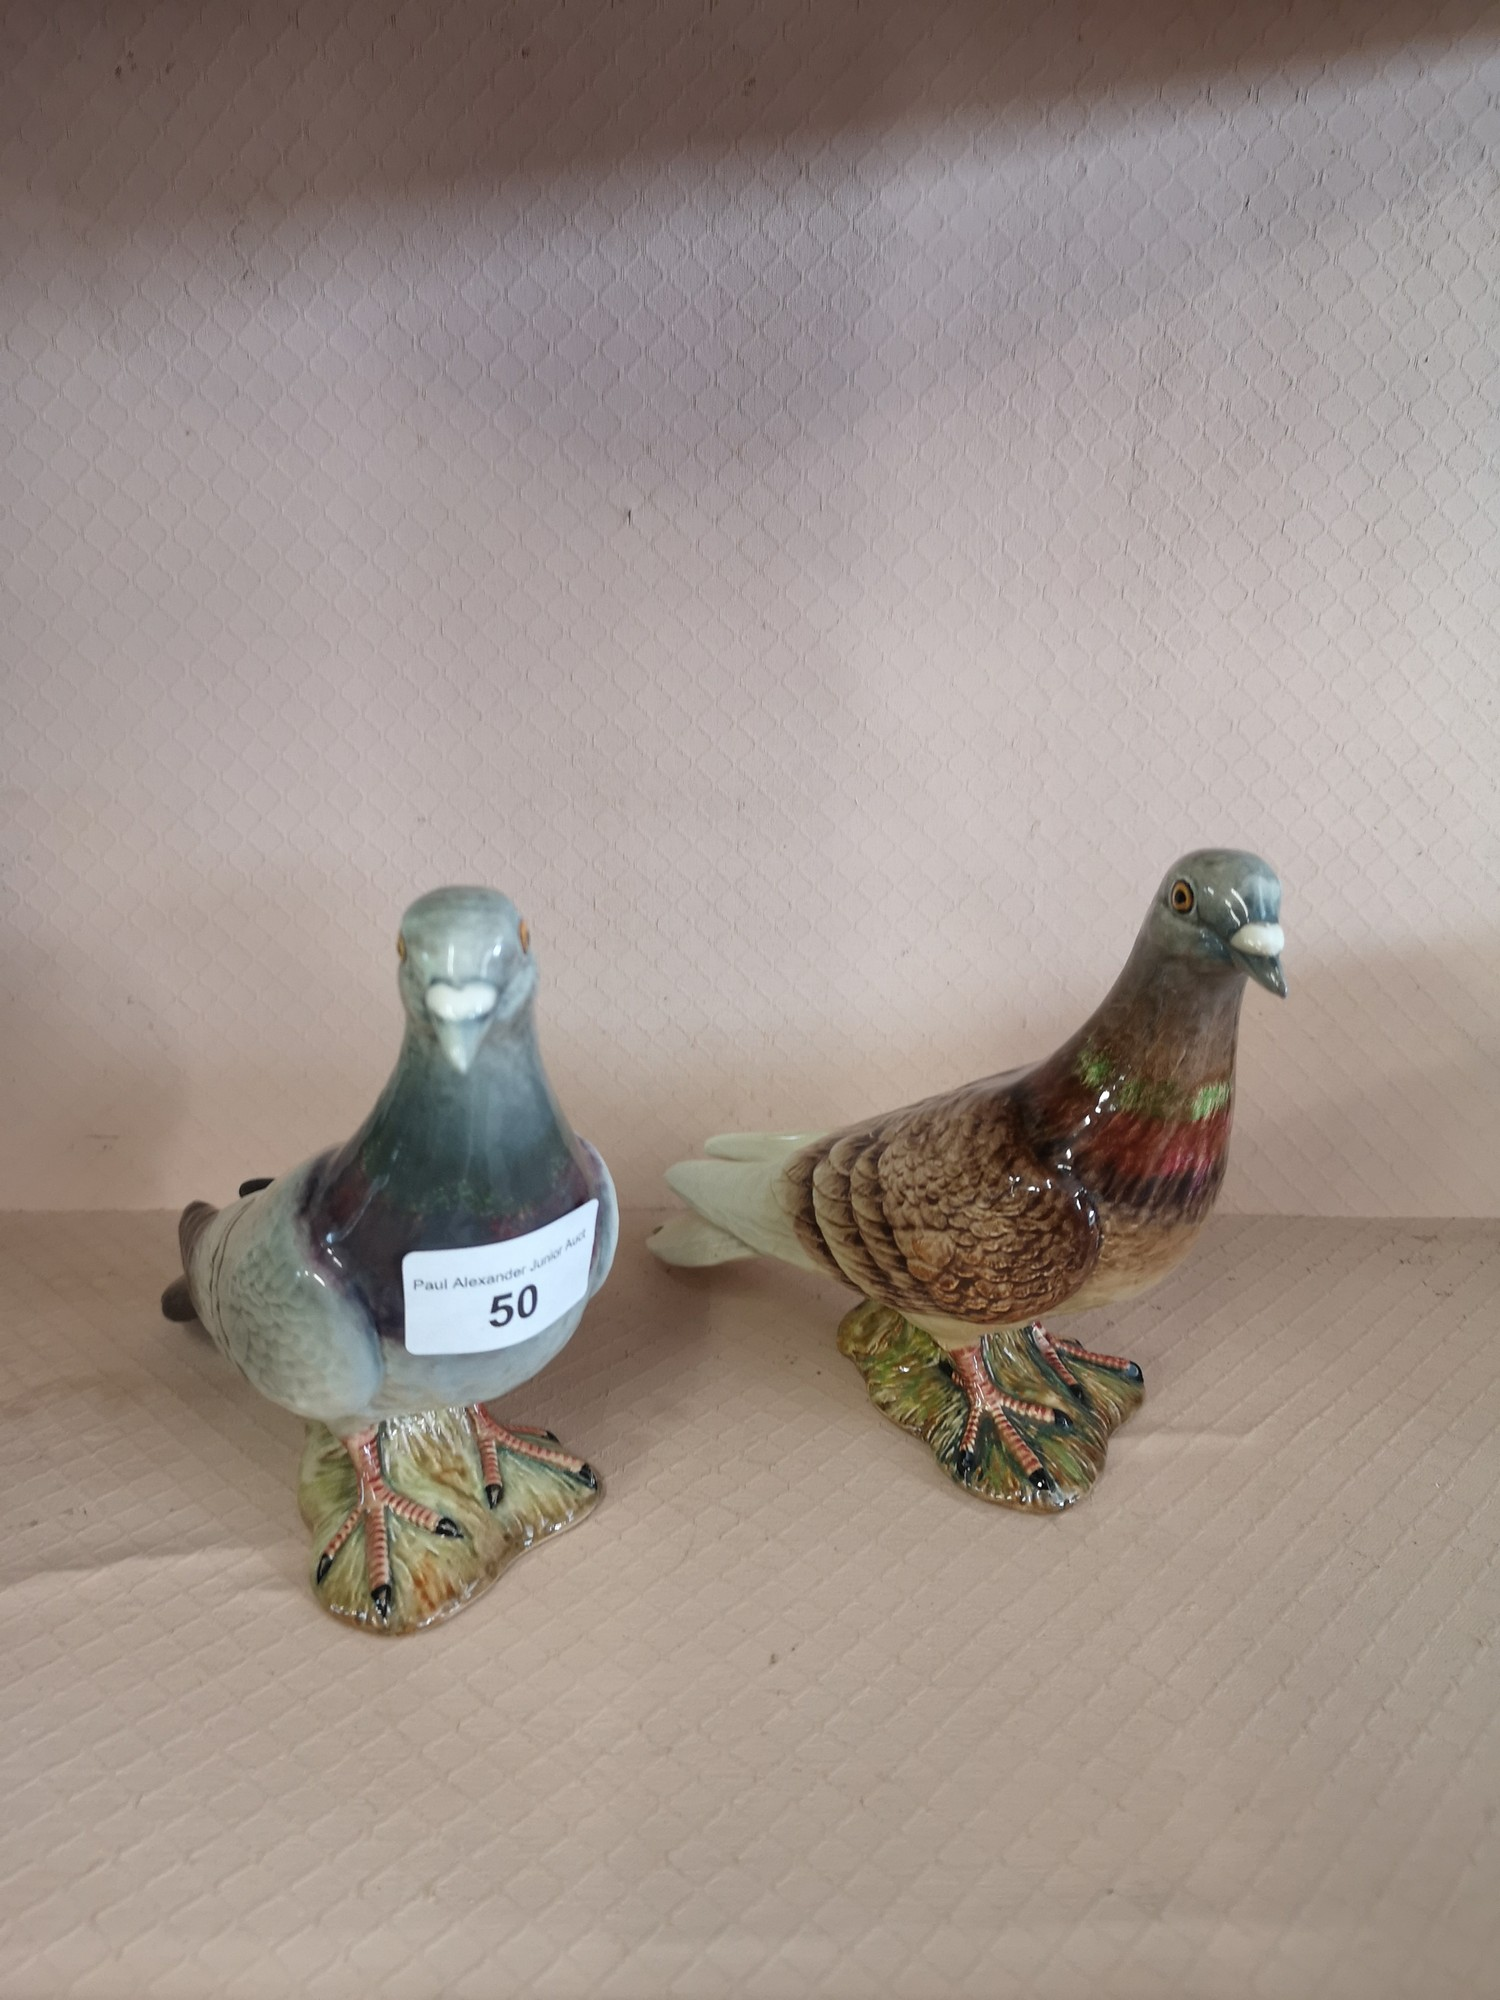 2 Beswick pigeon figure. 1 af.